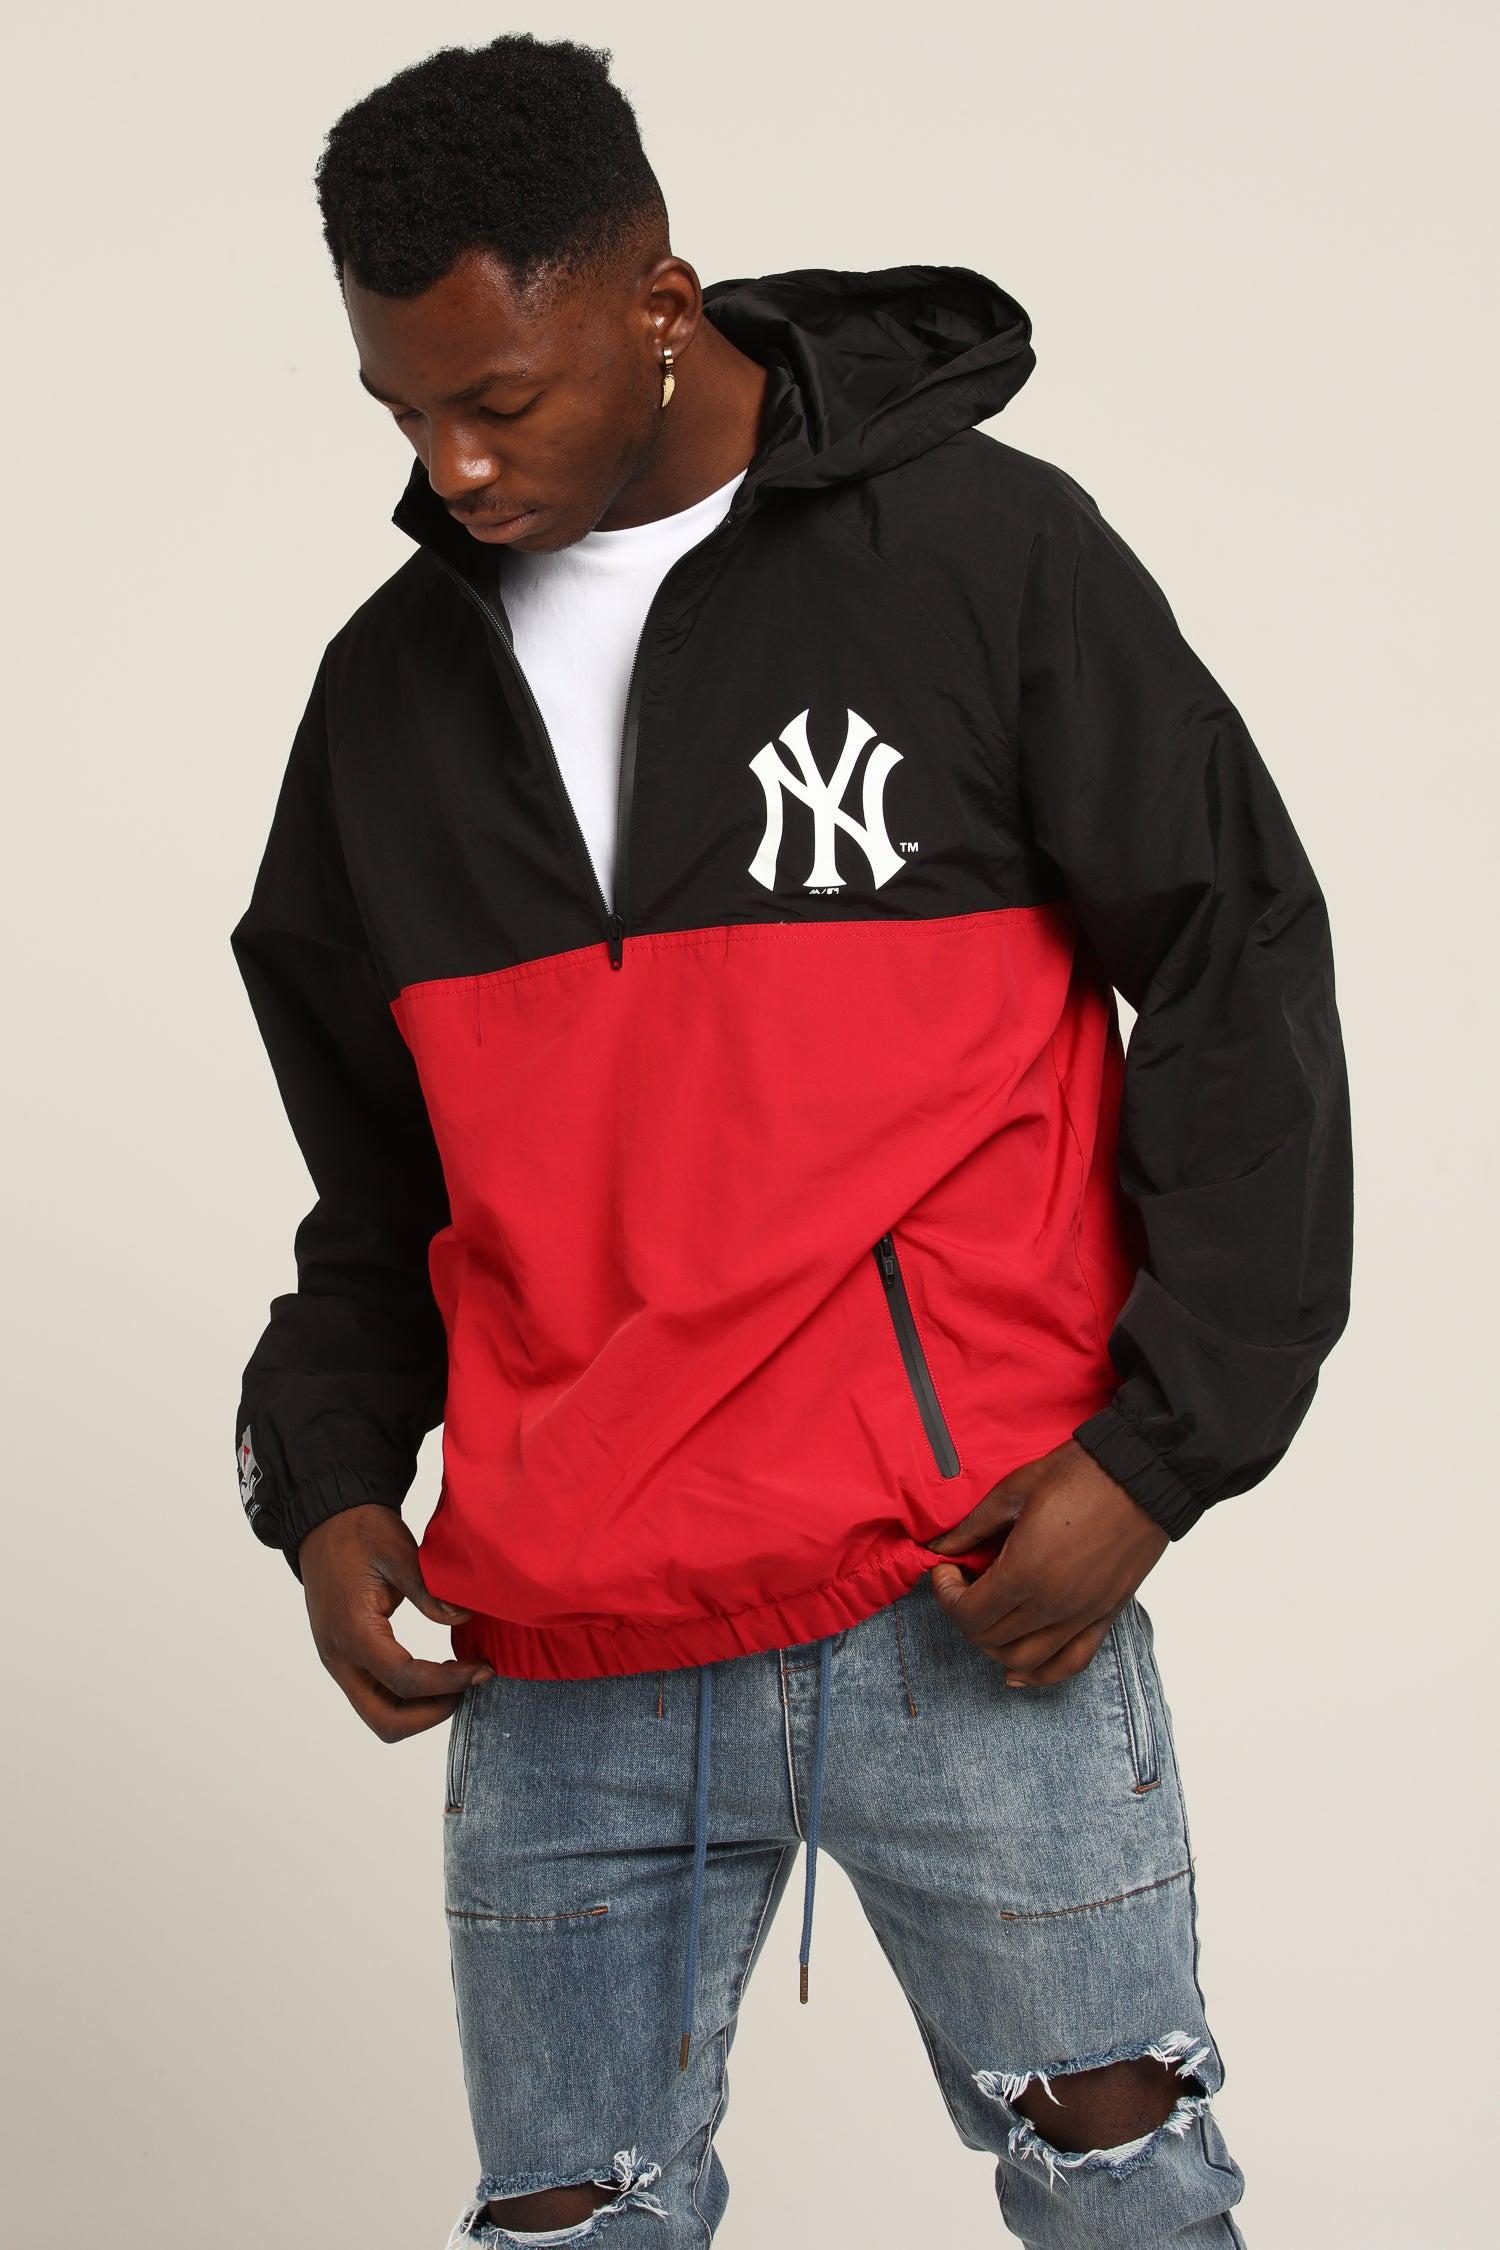 Majestic Athletic New York Yankees Bellemeade Jacket BlackRed